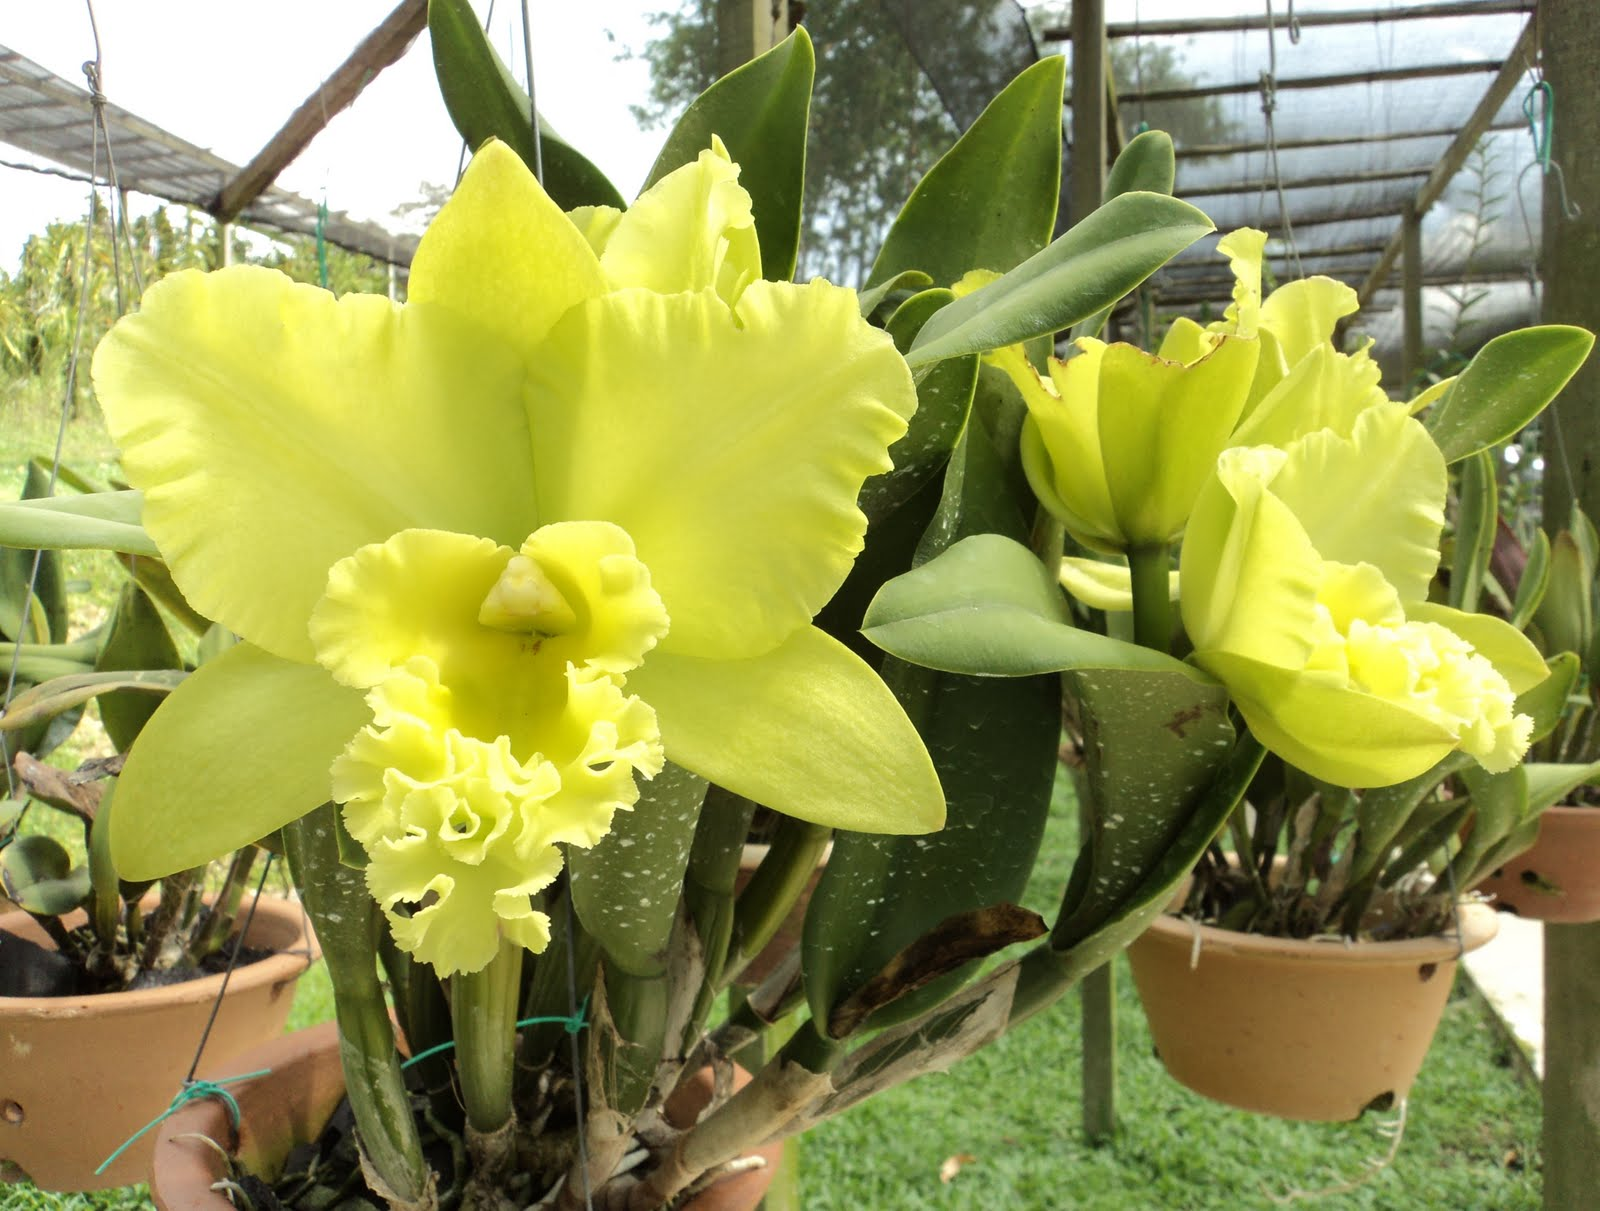 Cattleya spp